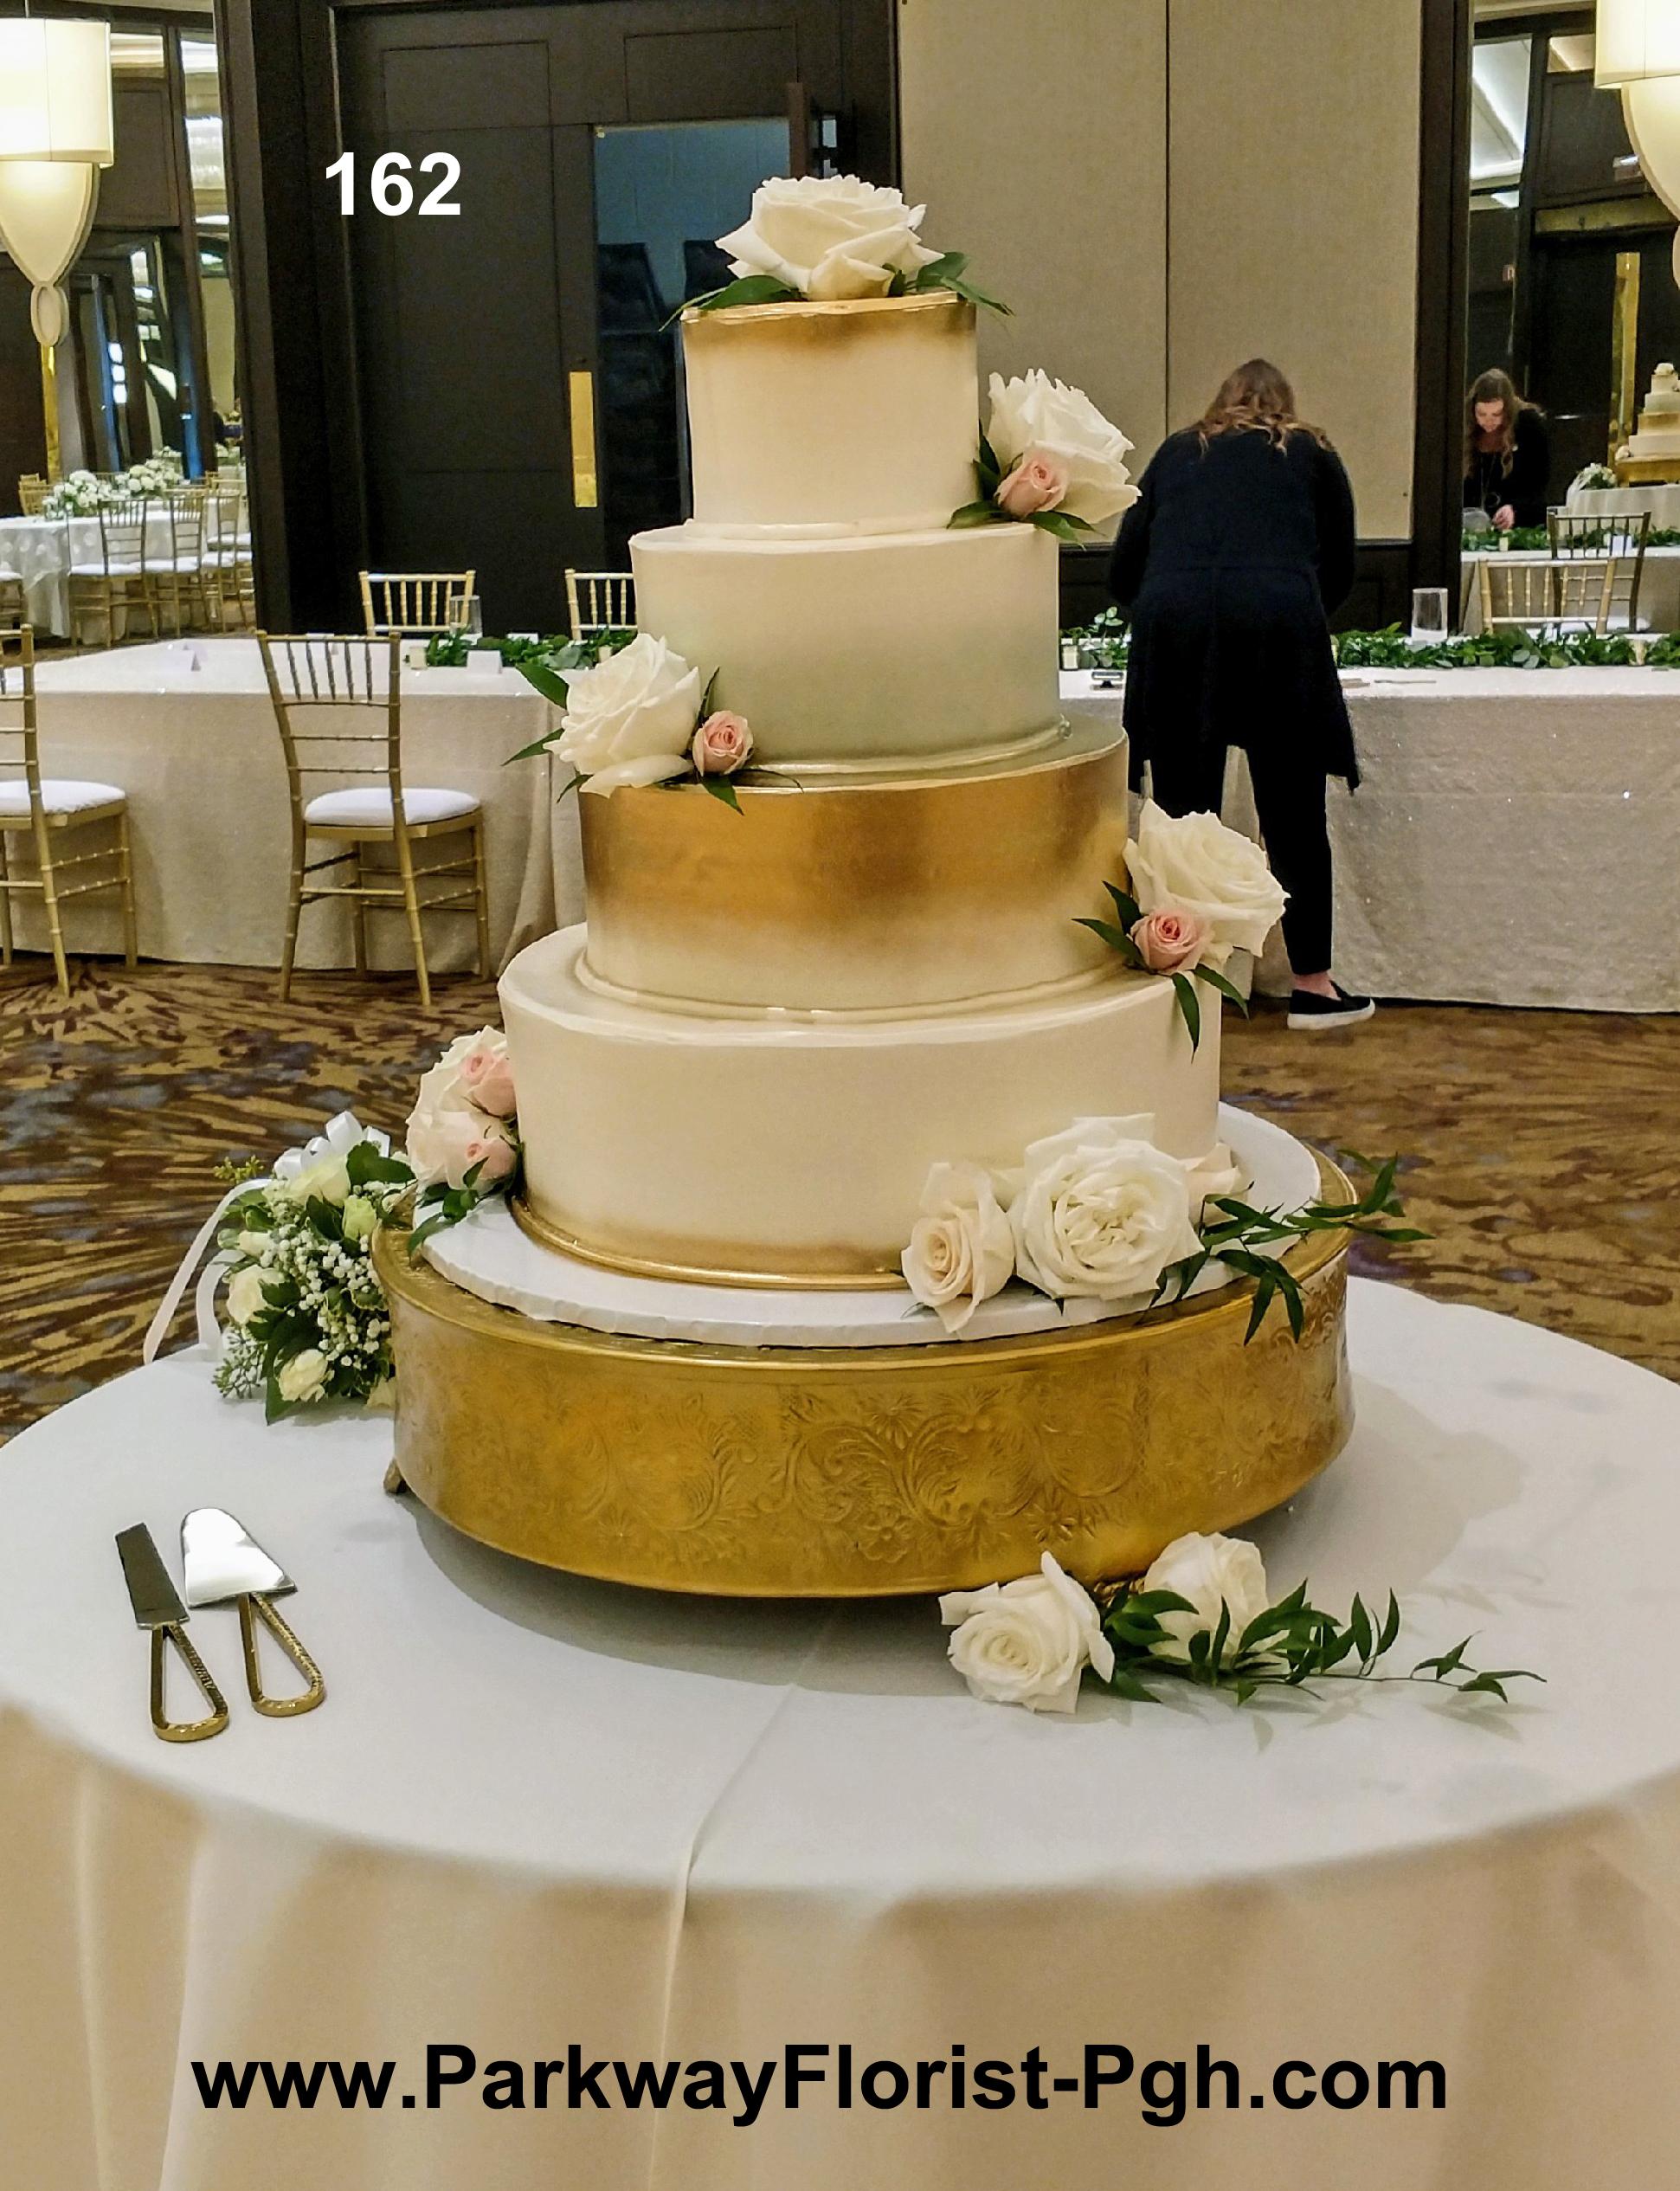 cake 162